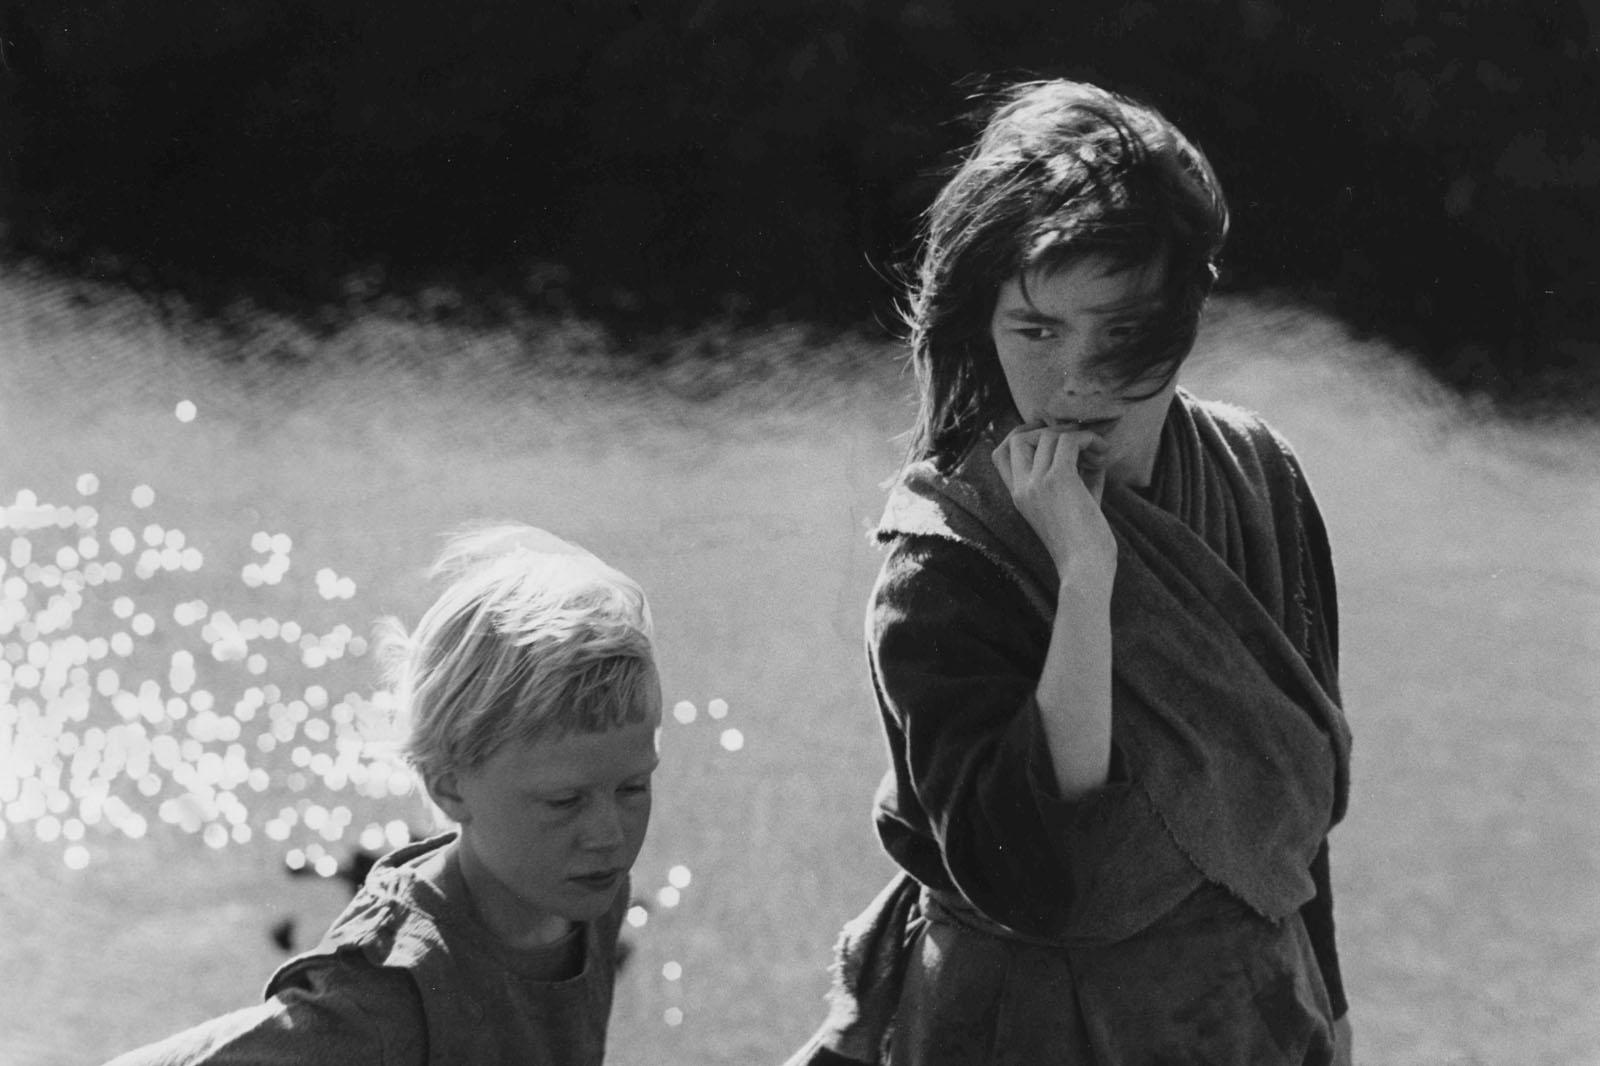 björk guðmundsdóttir: Björk - The Juniper Tree - A Dark Tale Of Witchcraft  & Mysticism (1986) - [AAC-M4A]